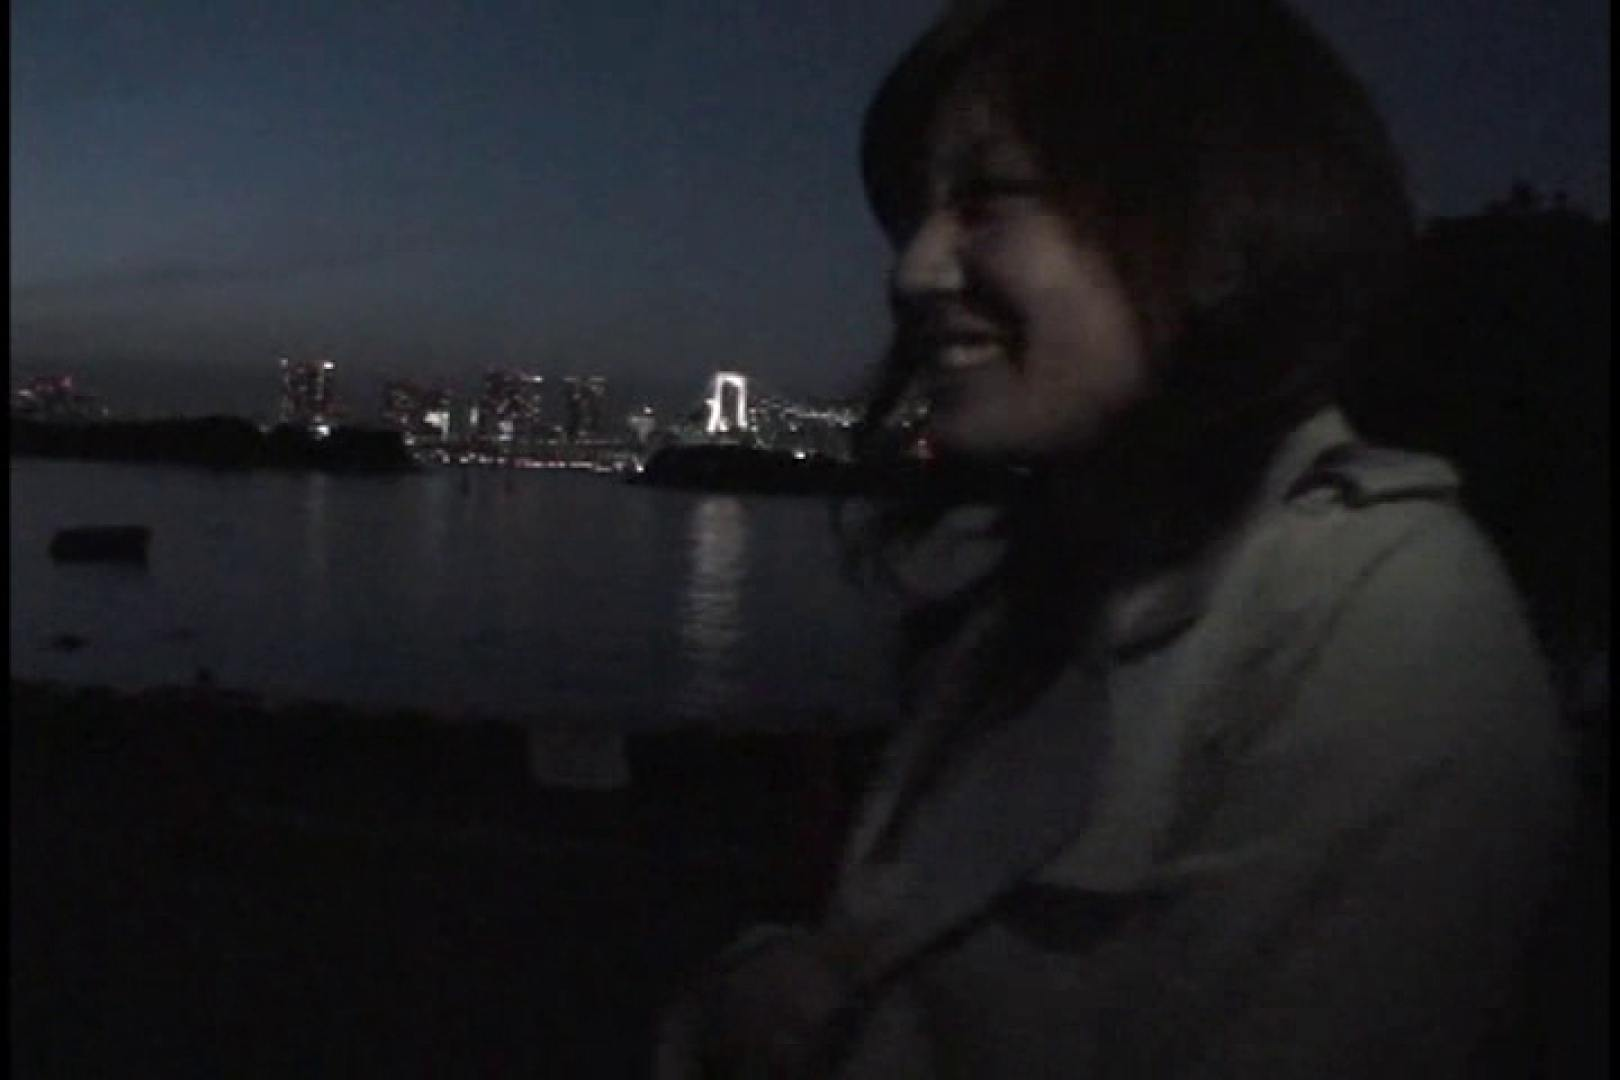 JDハンター全国ツアー vol.035 後編 女子大生のエロ生活   OLのエロ生活  47連発 15